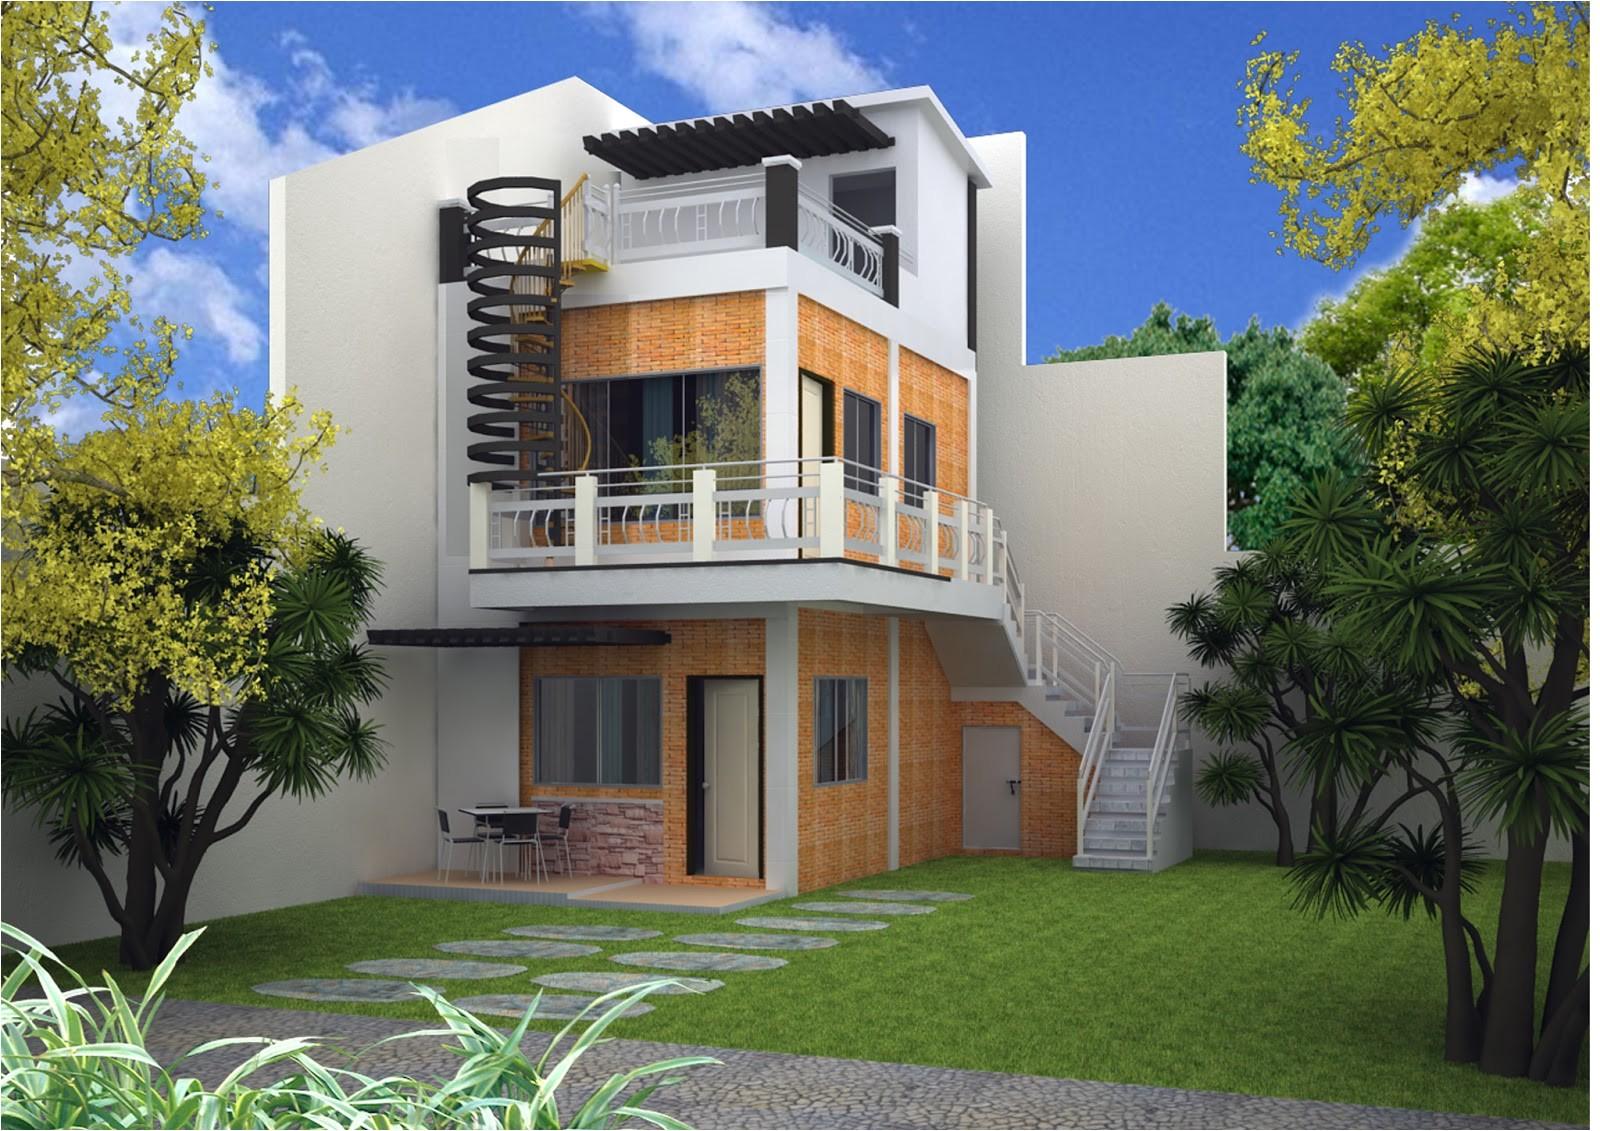 imagined 2 storey modern house plans